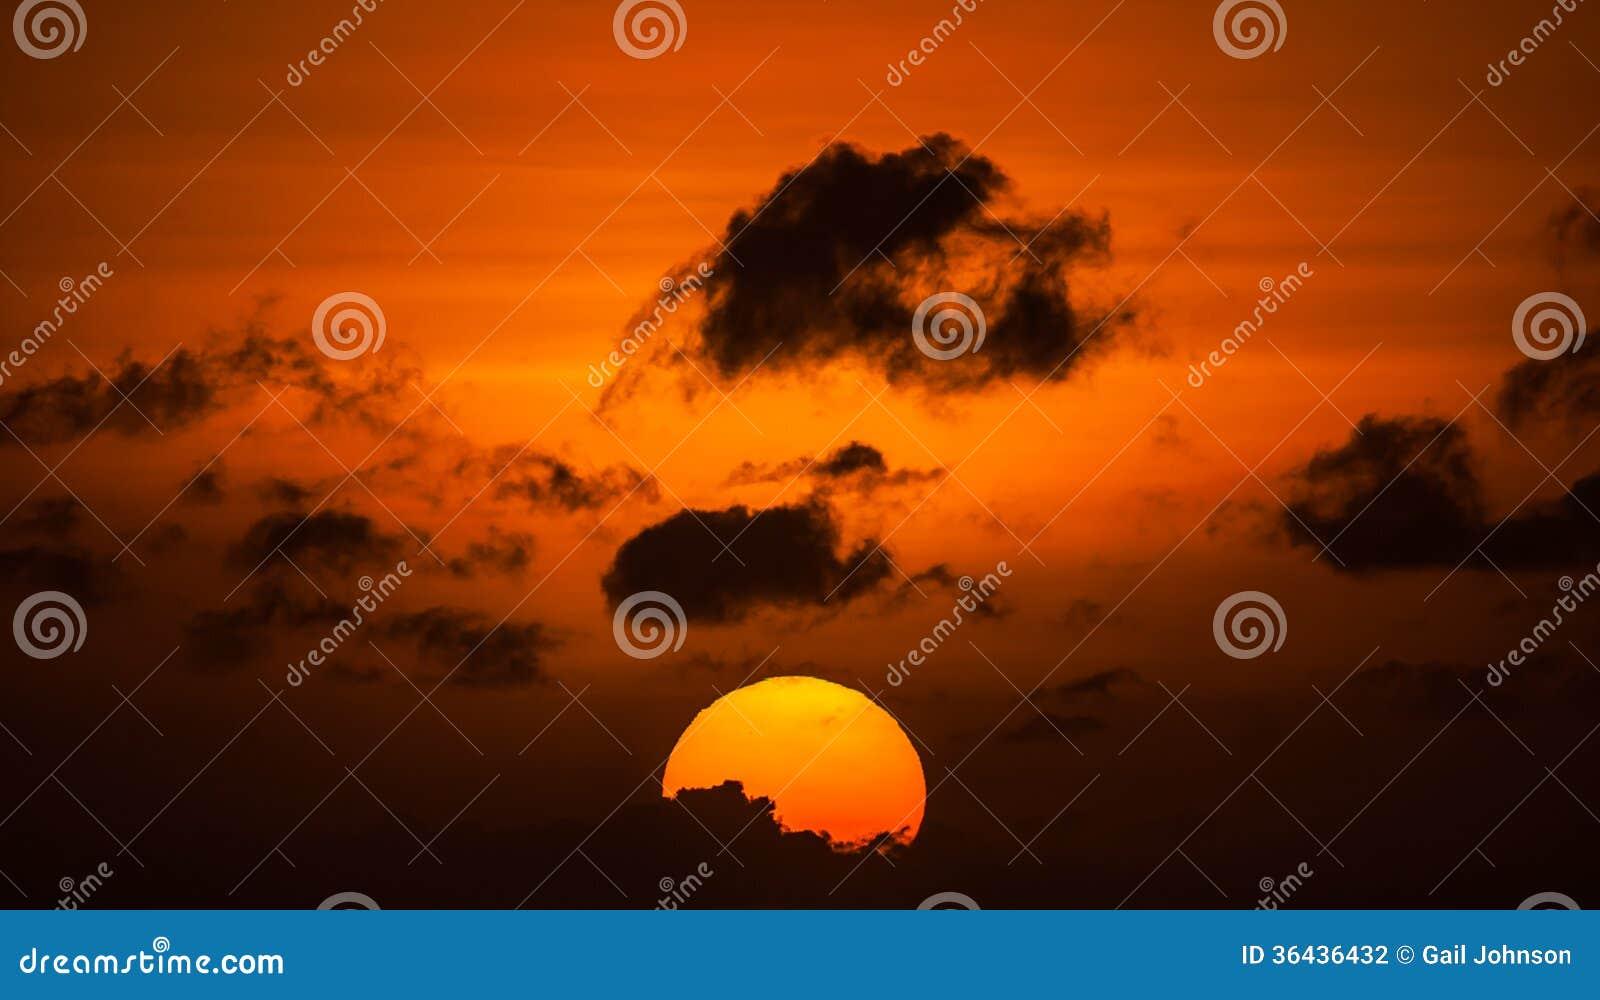 setting sun african caribbean - photo #21